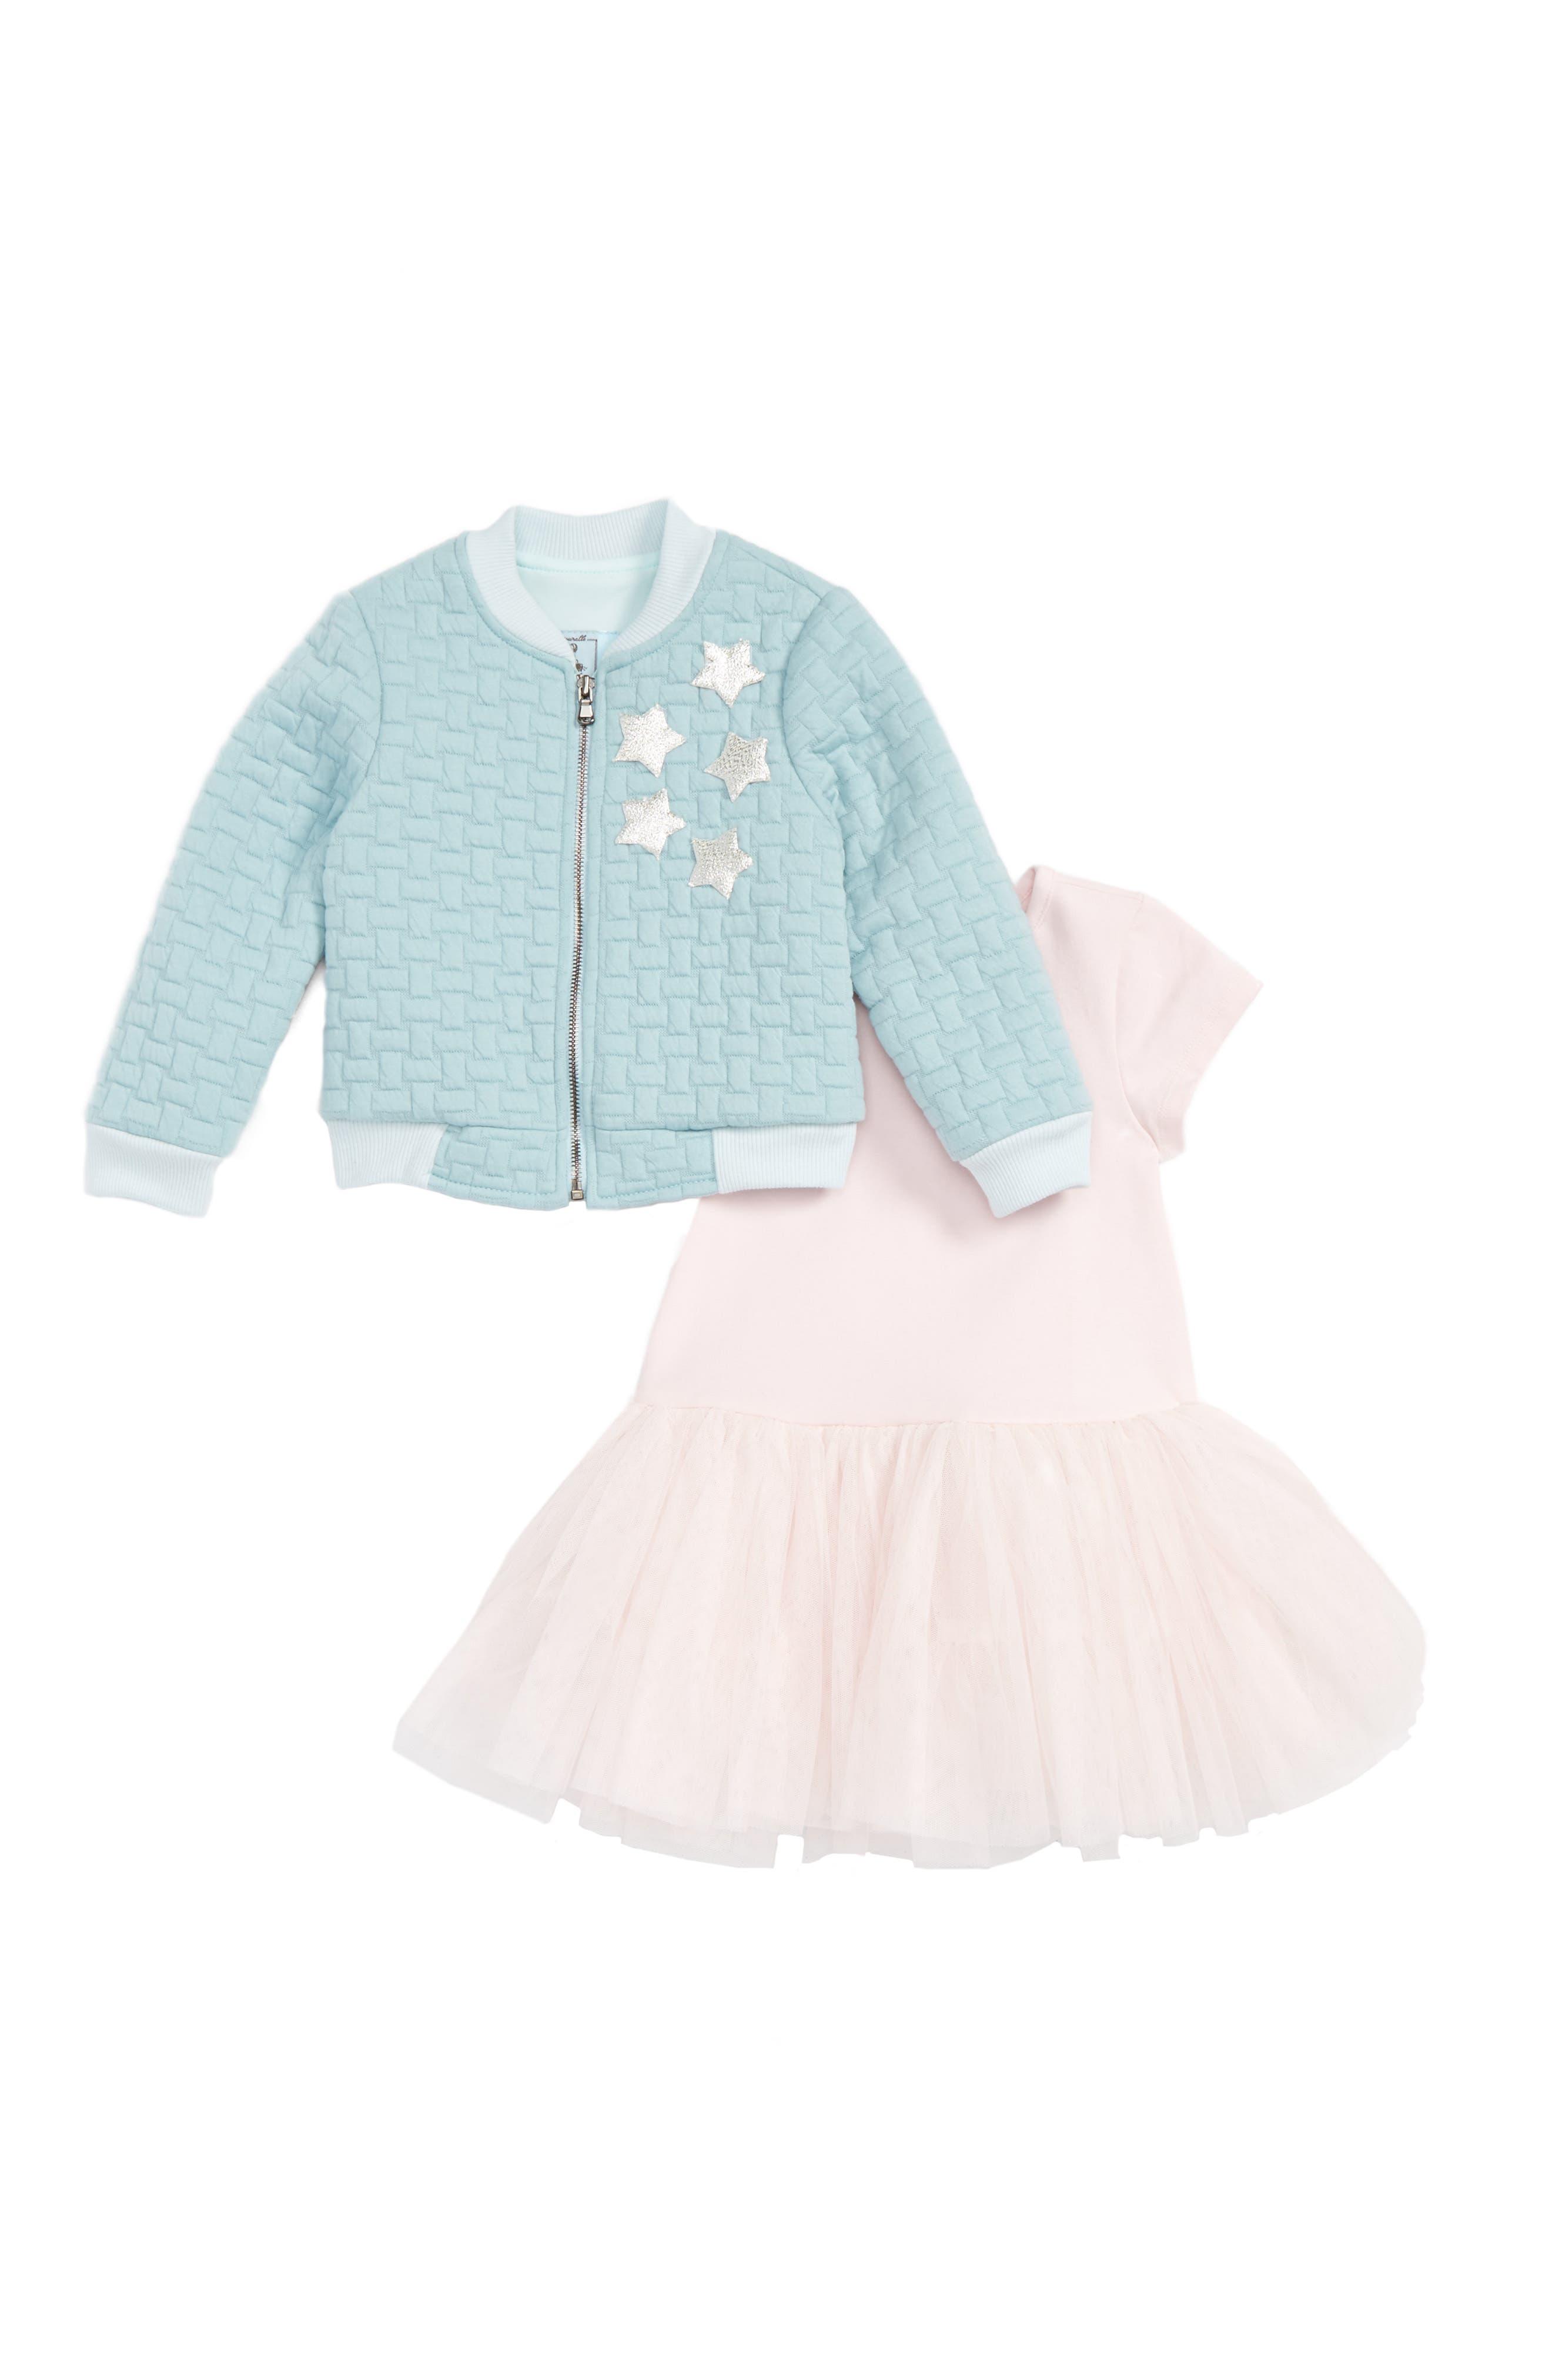 Alternate Image 1 Selected - Pippa & Julie Bomber Jacket & Tulle Dress Set (Toddler Girls & Little Girls)